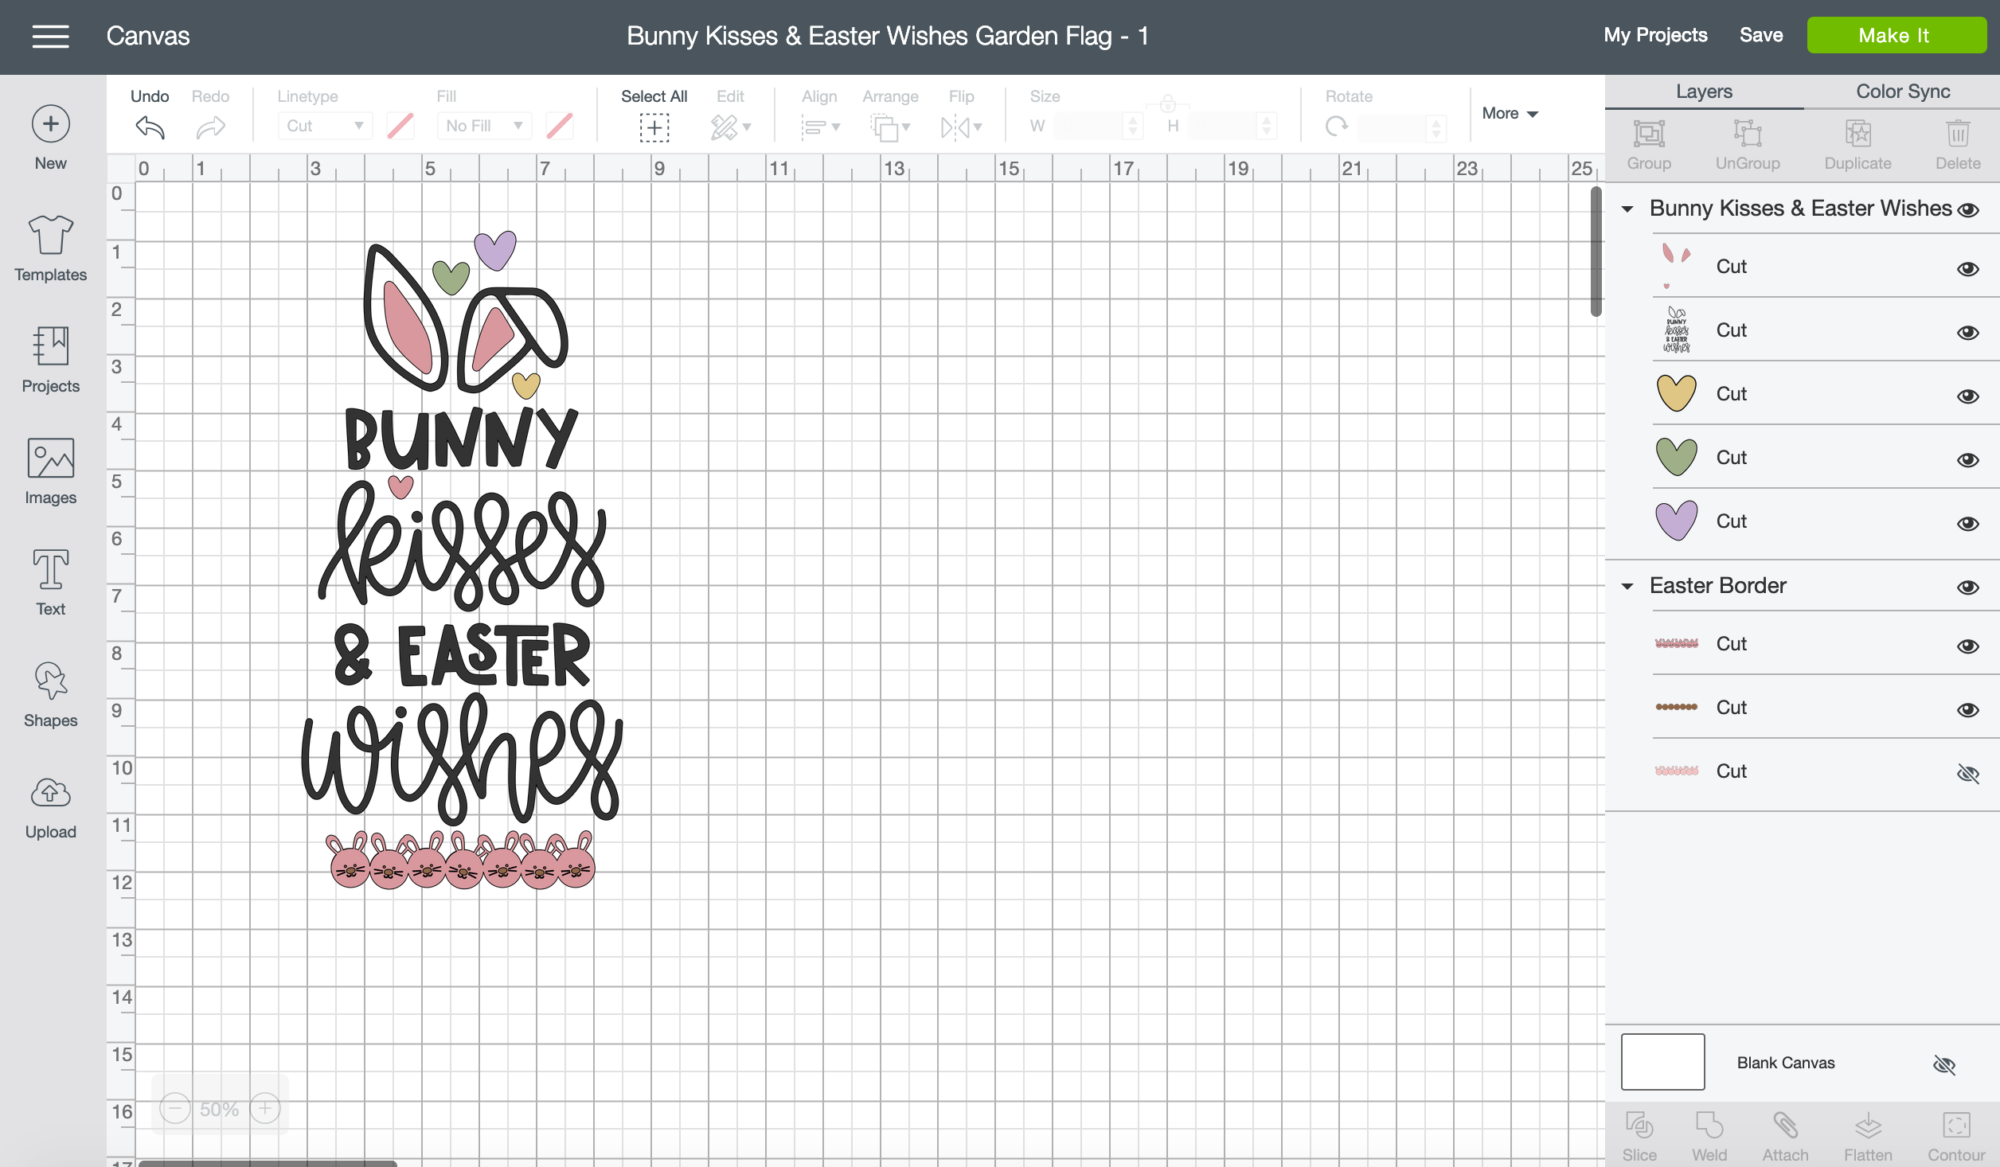 Bunny Kisses & Easter Wishes Burlap Garden Flag Screen shot in Cricut Design Space.